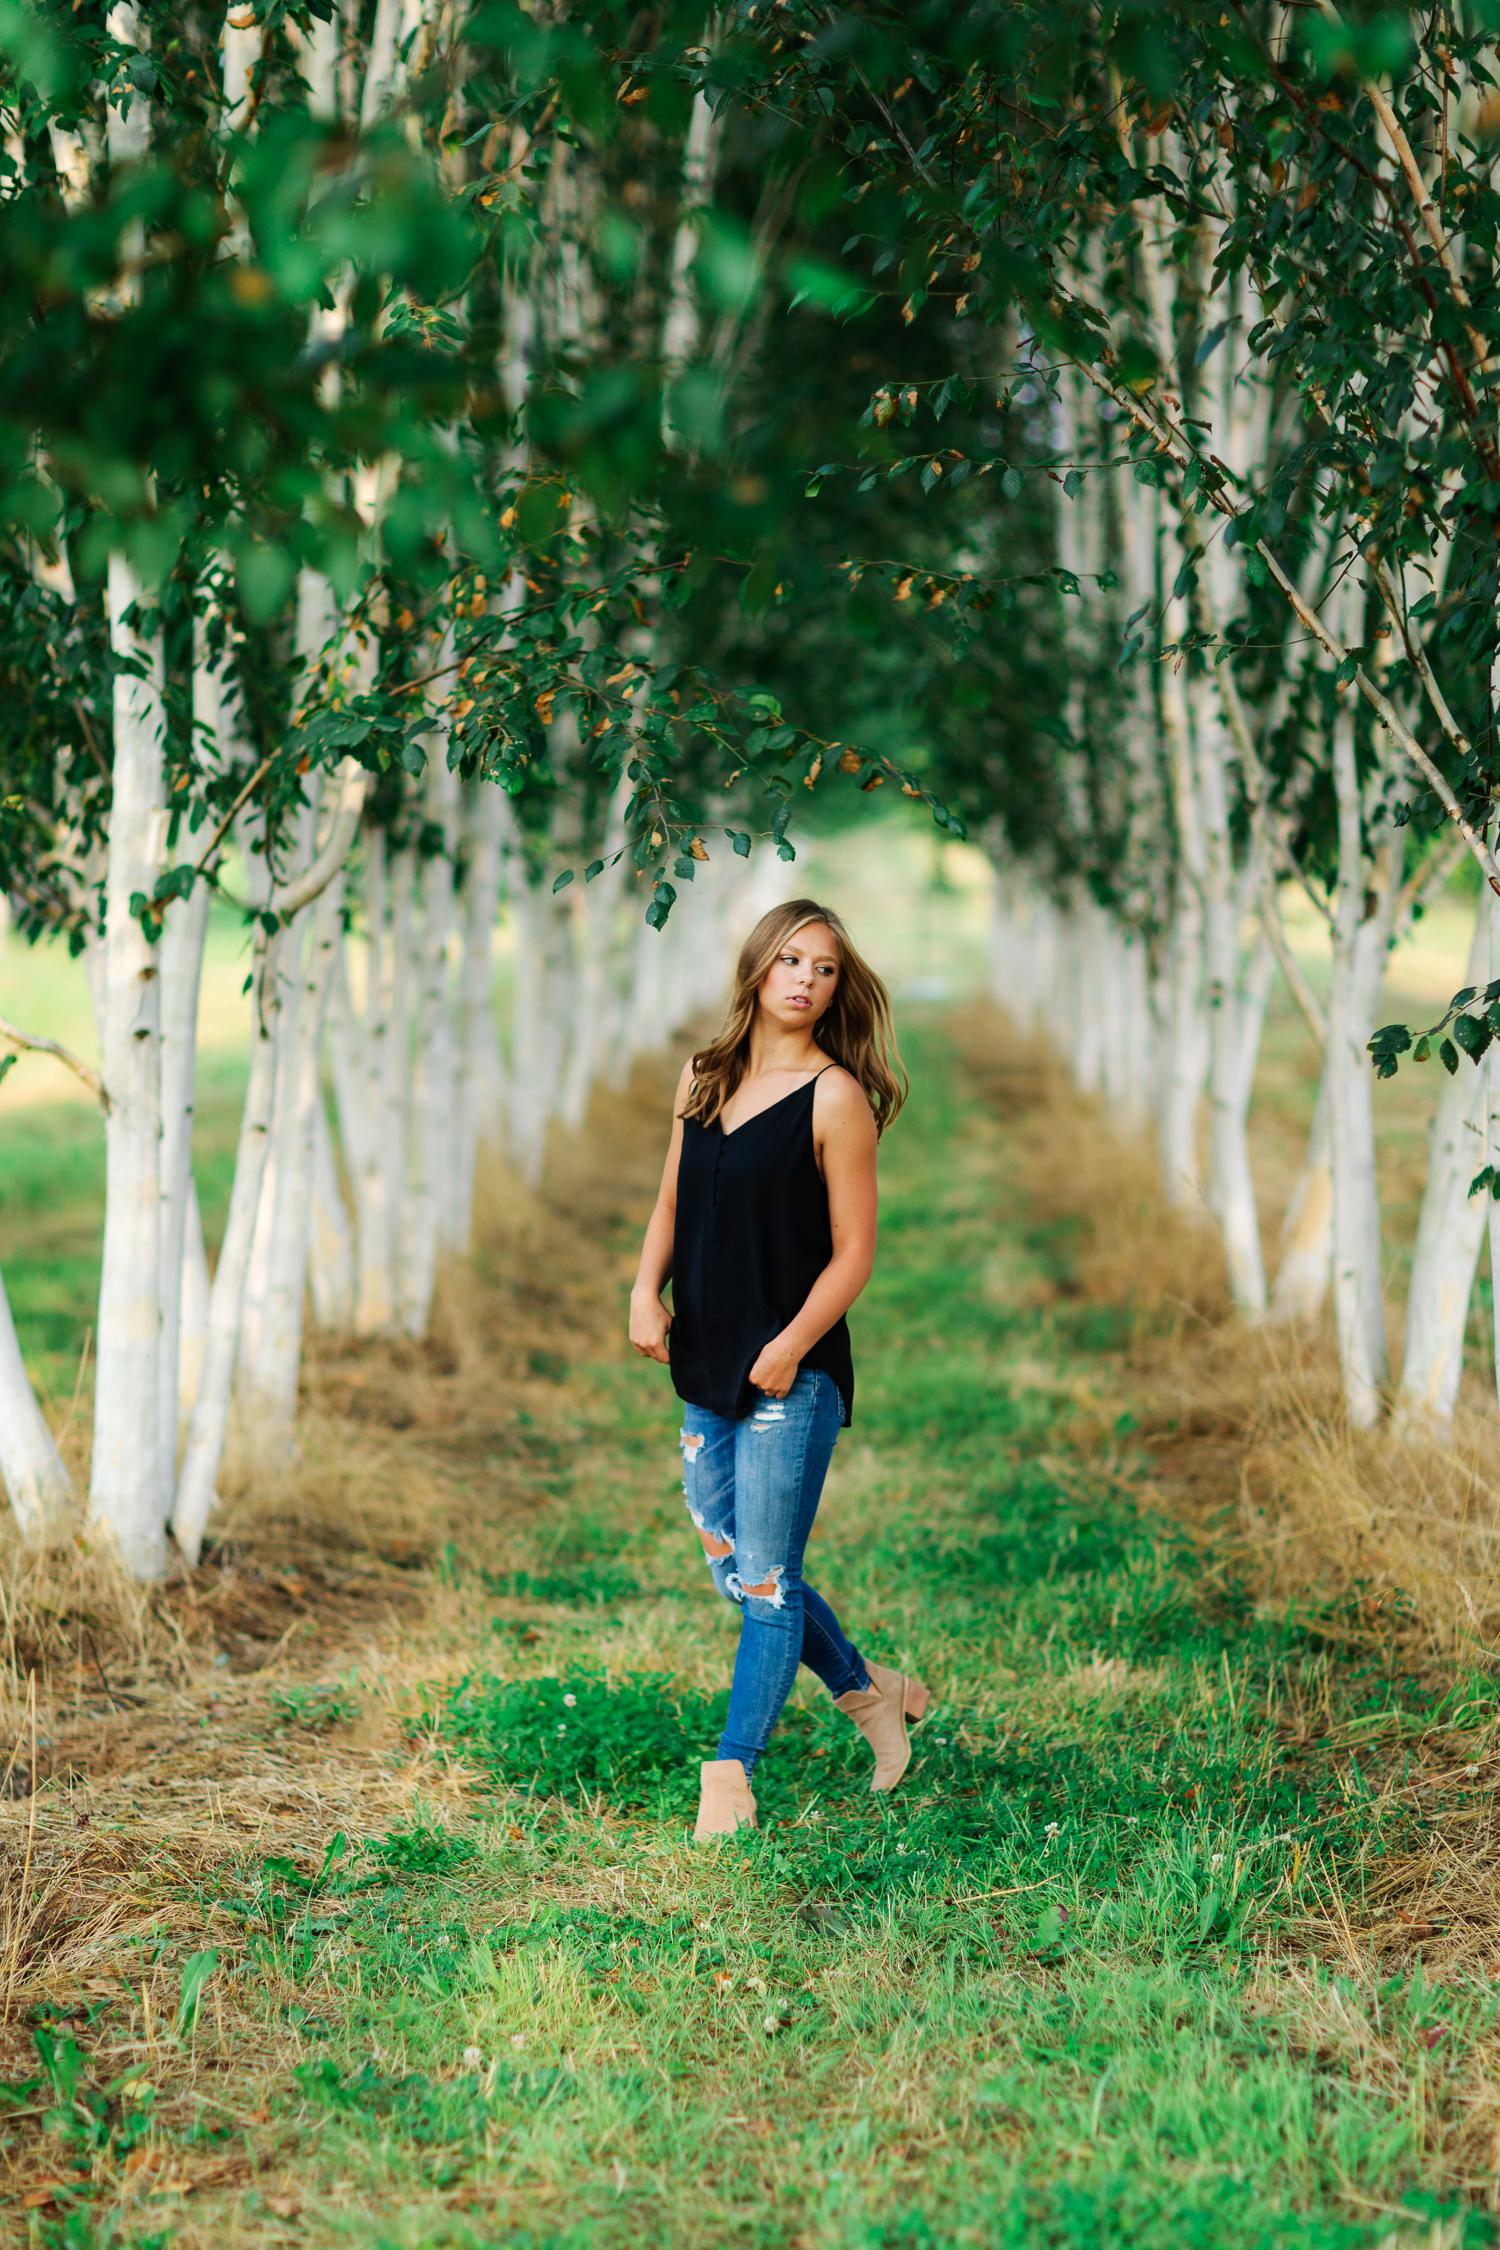 ariellanoellephotography-juanita-bay-highschool-kirkland-washington-area-senior-portrait-photographer-1-2.jpg